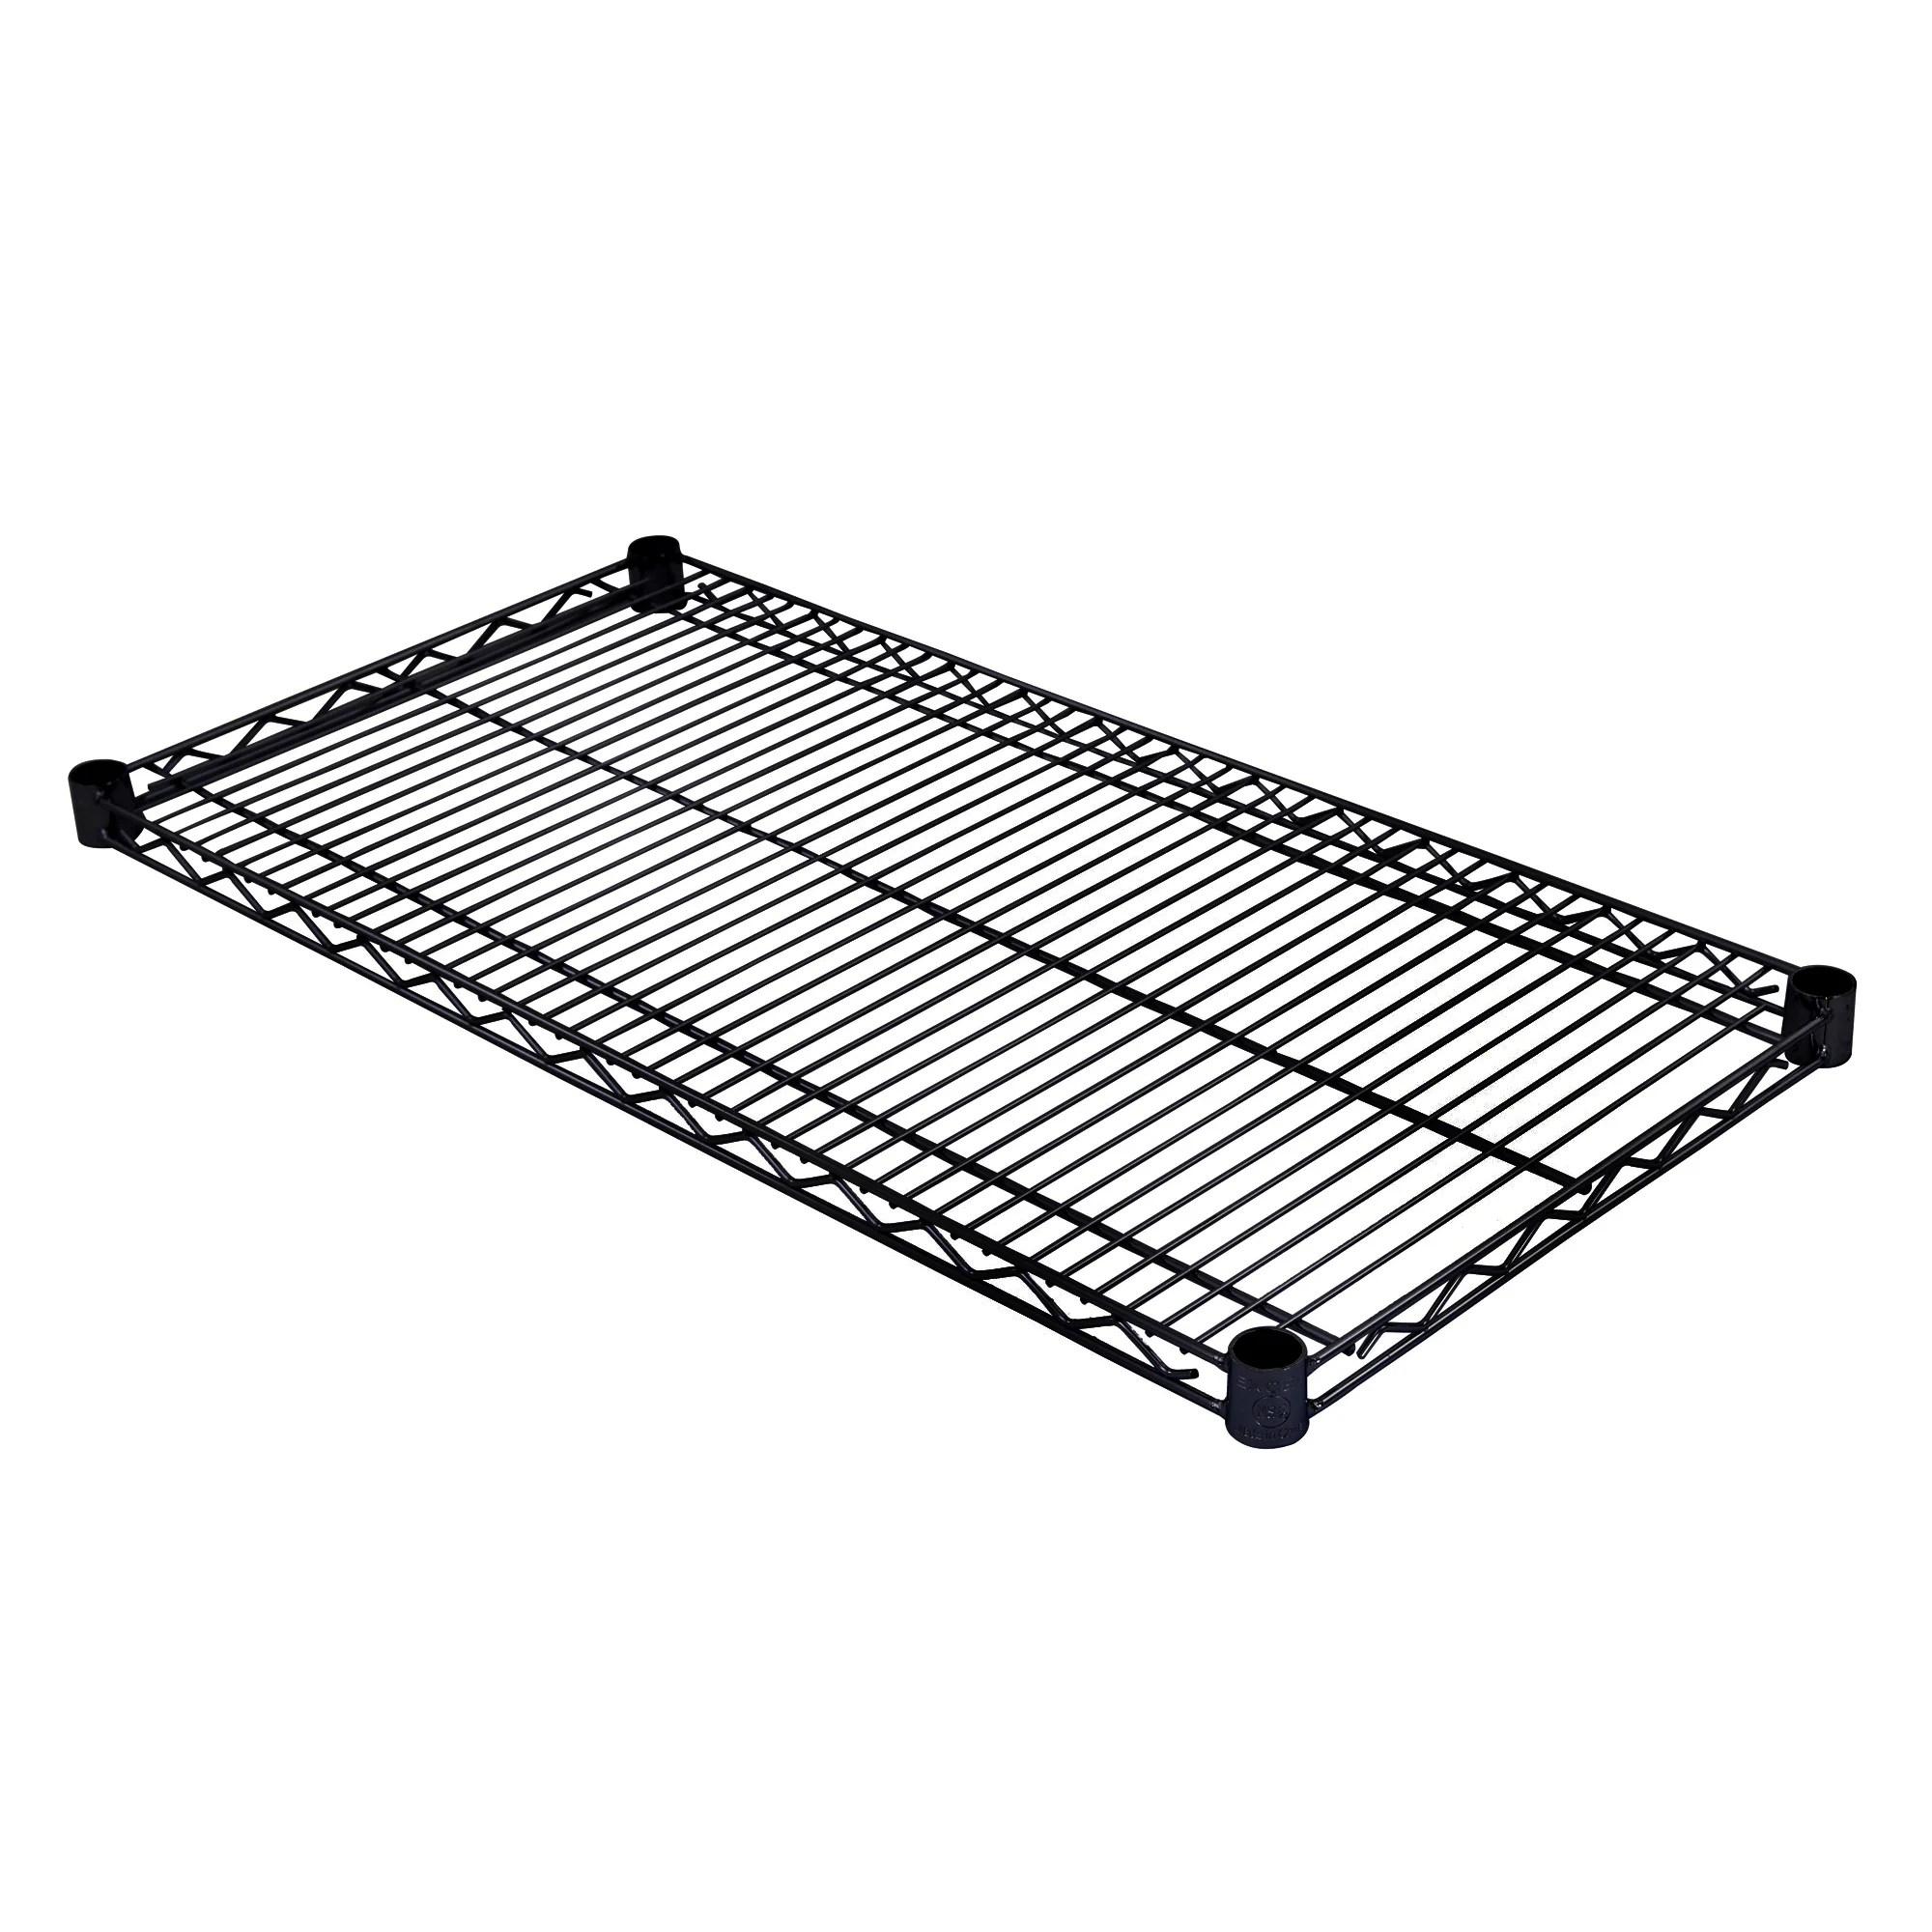 Excel Four Shelf Es Wire Shelving Unit Amp Reviews